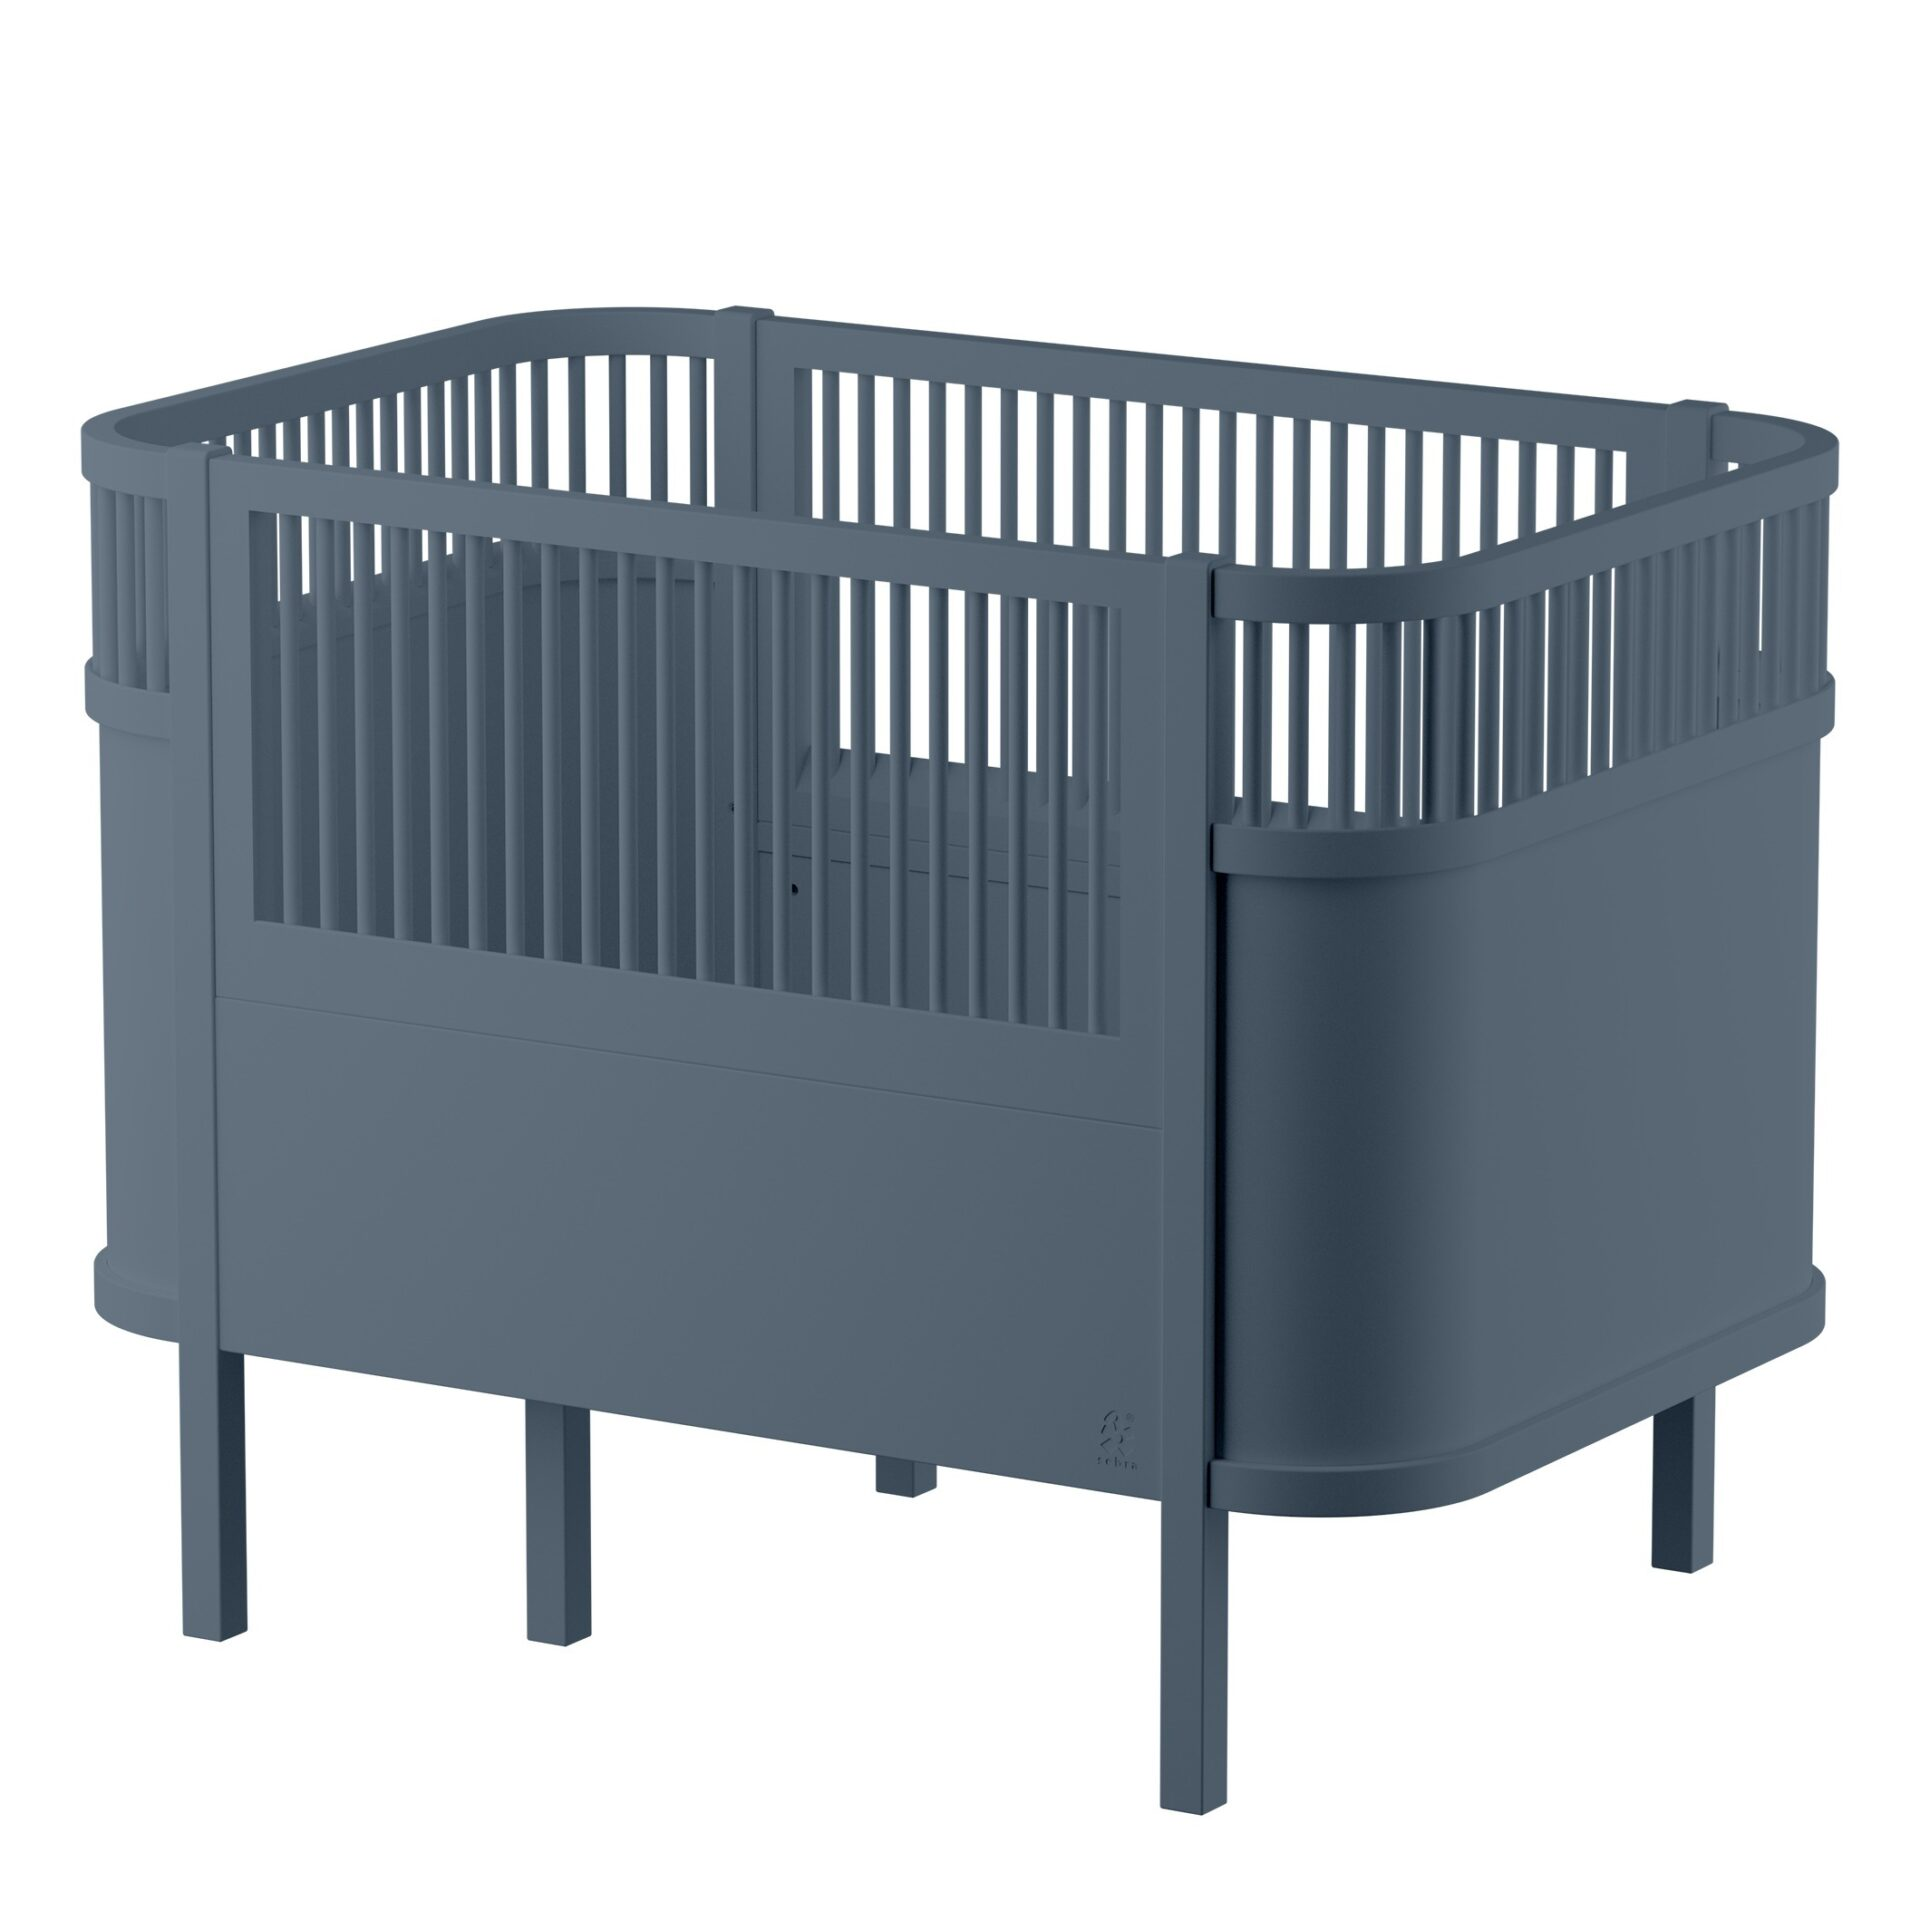 Sebra Bett in Grau für Babys